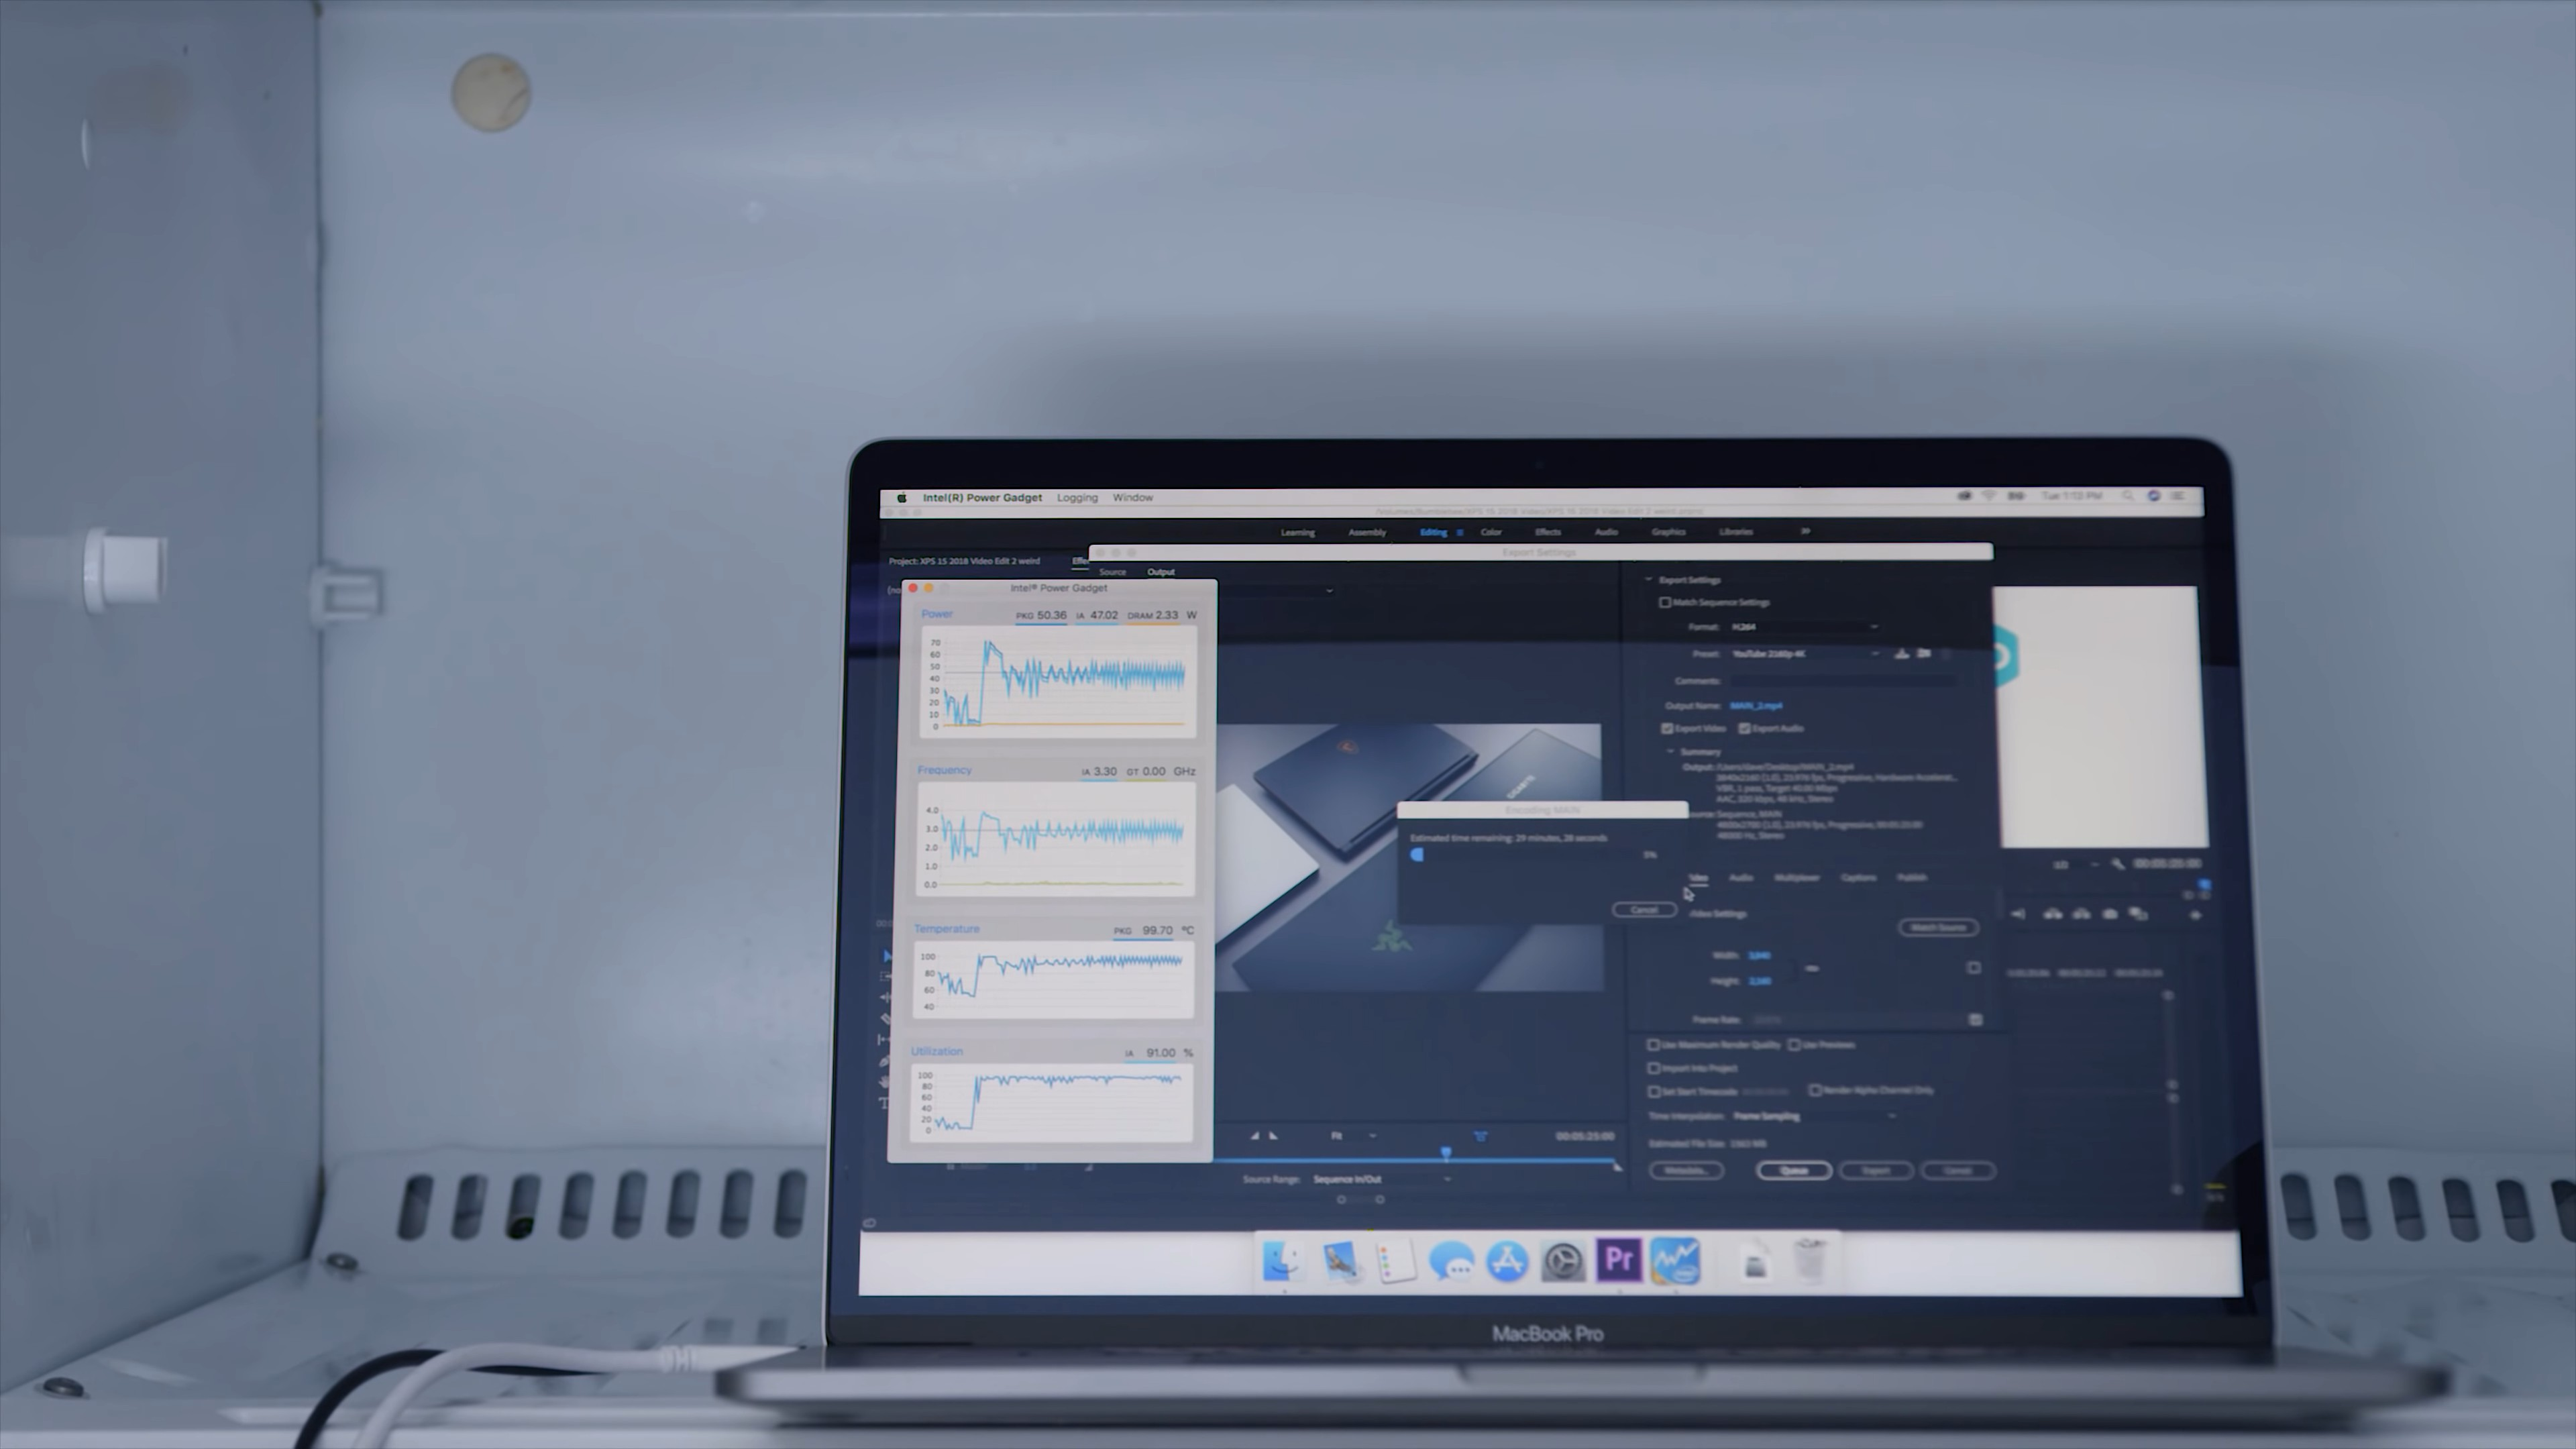 MacBook Pro 2019 i9